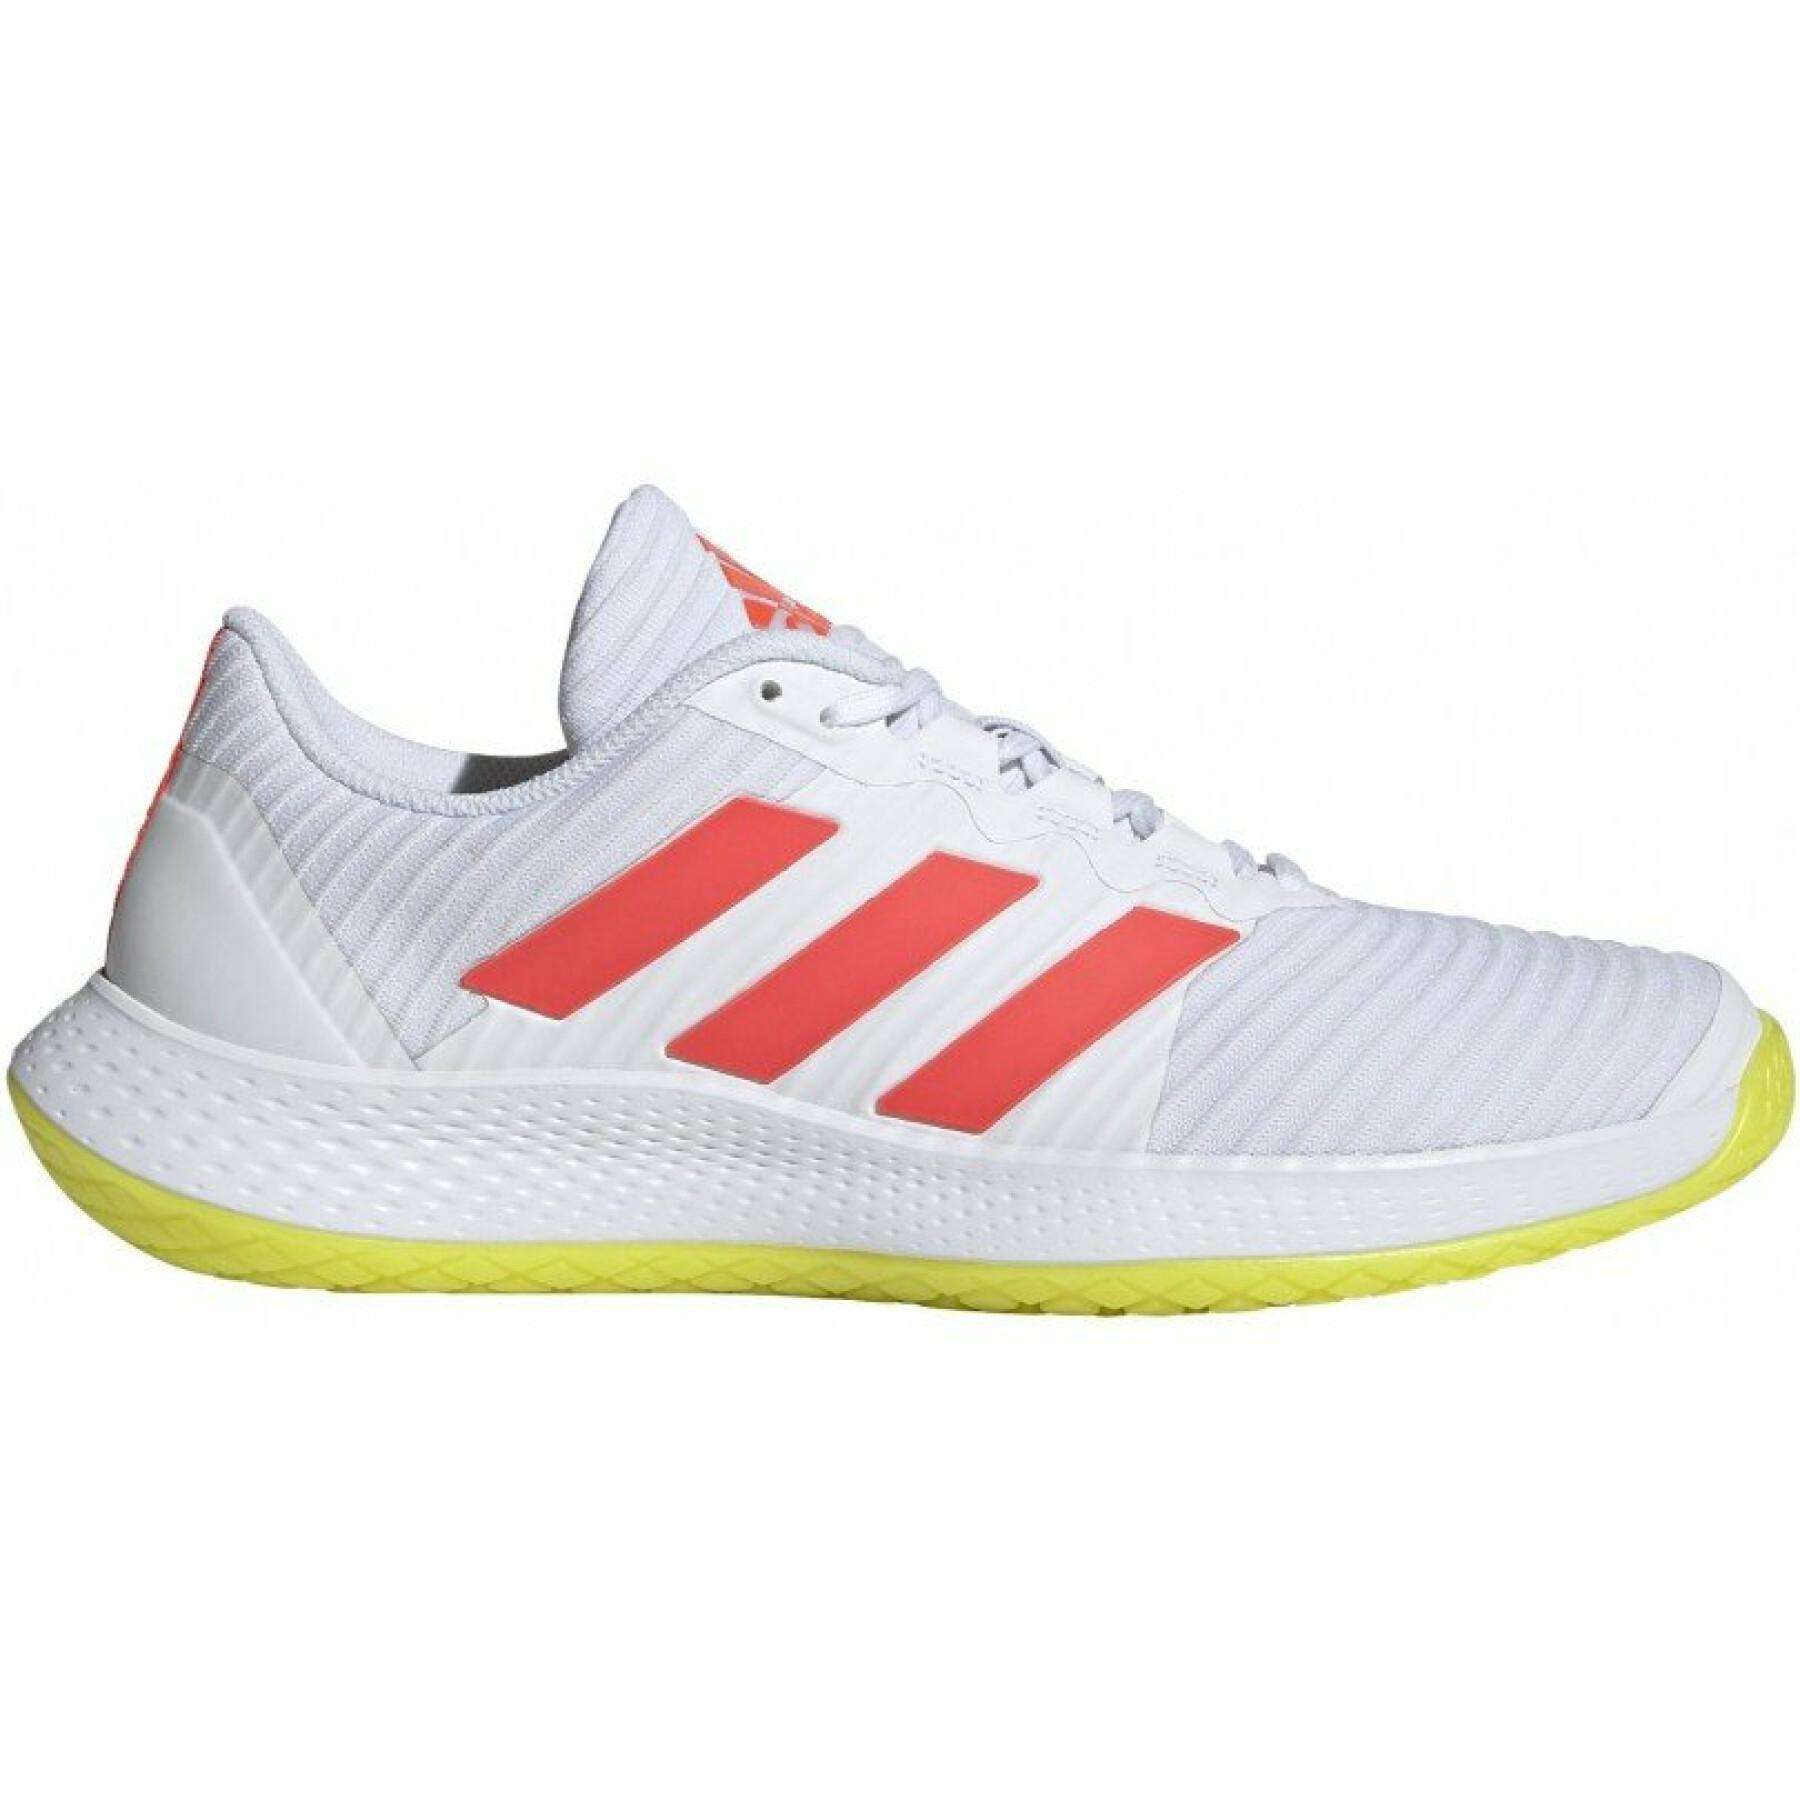 Shoes woman adidas ForceBounce Handball